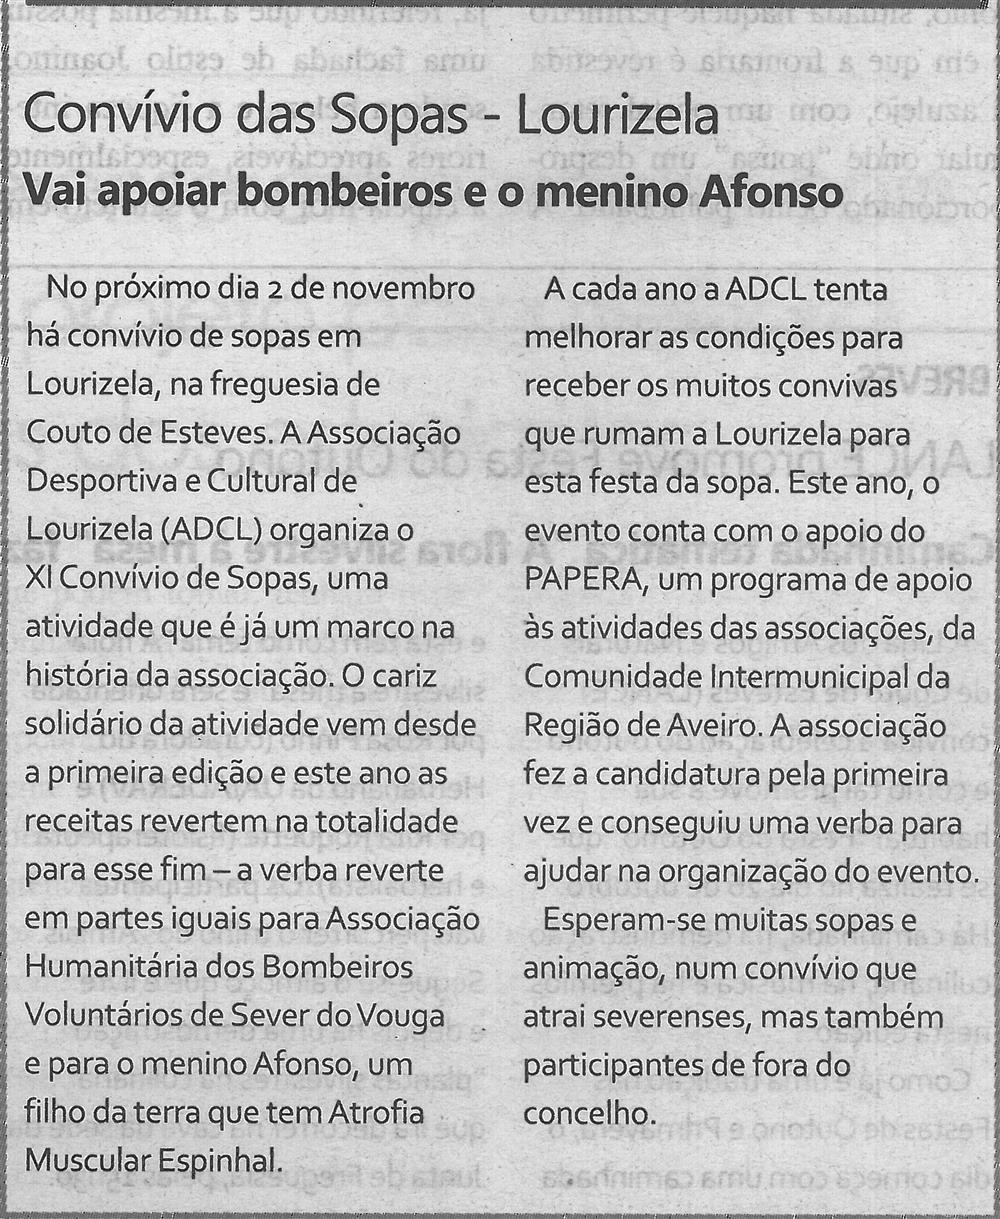 TV-out.'19-p.13-Convívio das Sopas, Lourizela, vai apoiar bombeiros e o menino Afonso.jpg